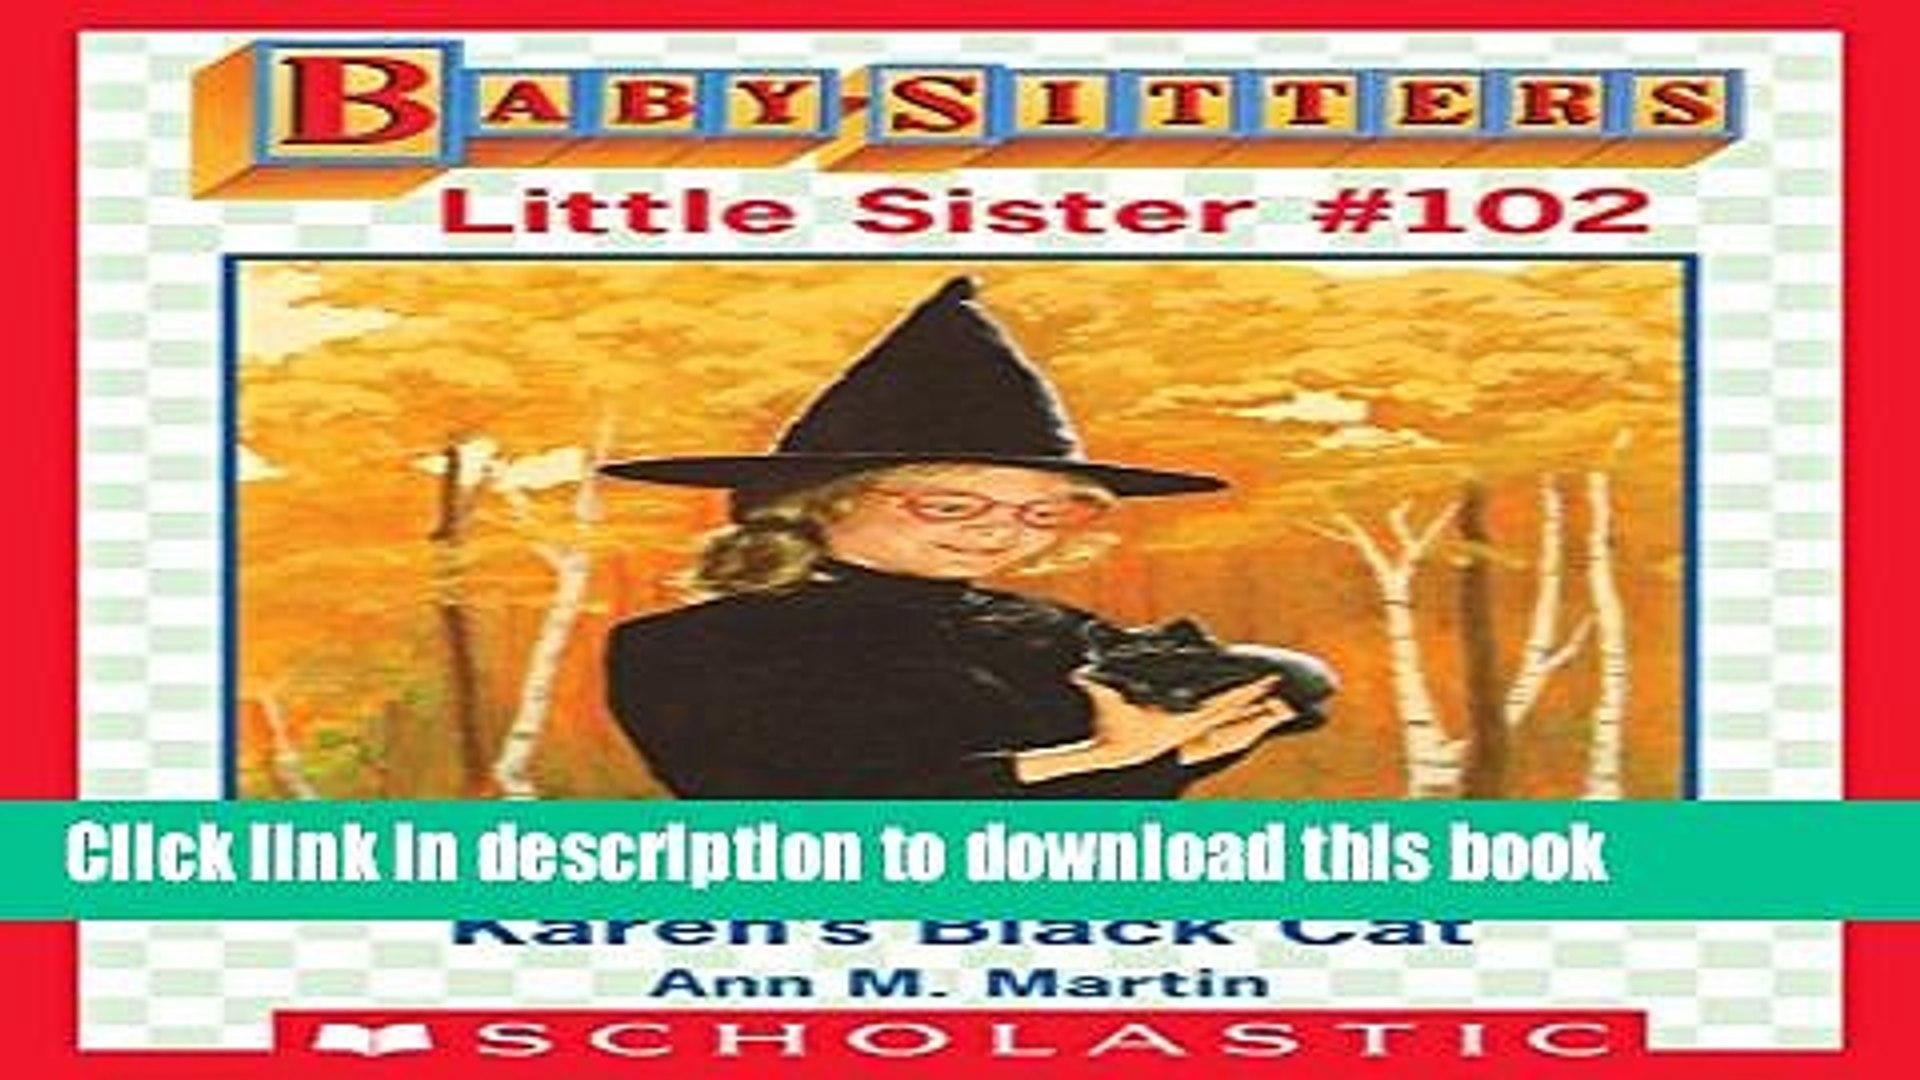 [Download] Karen s Black Cat (Baby-Sitters Little Sister #102) Paperback Free